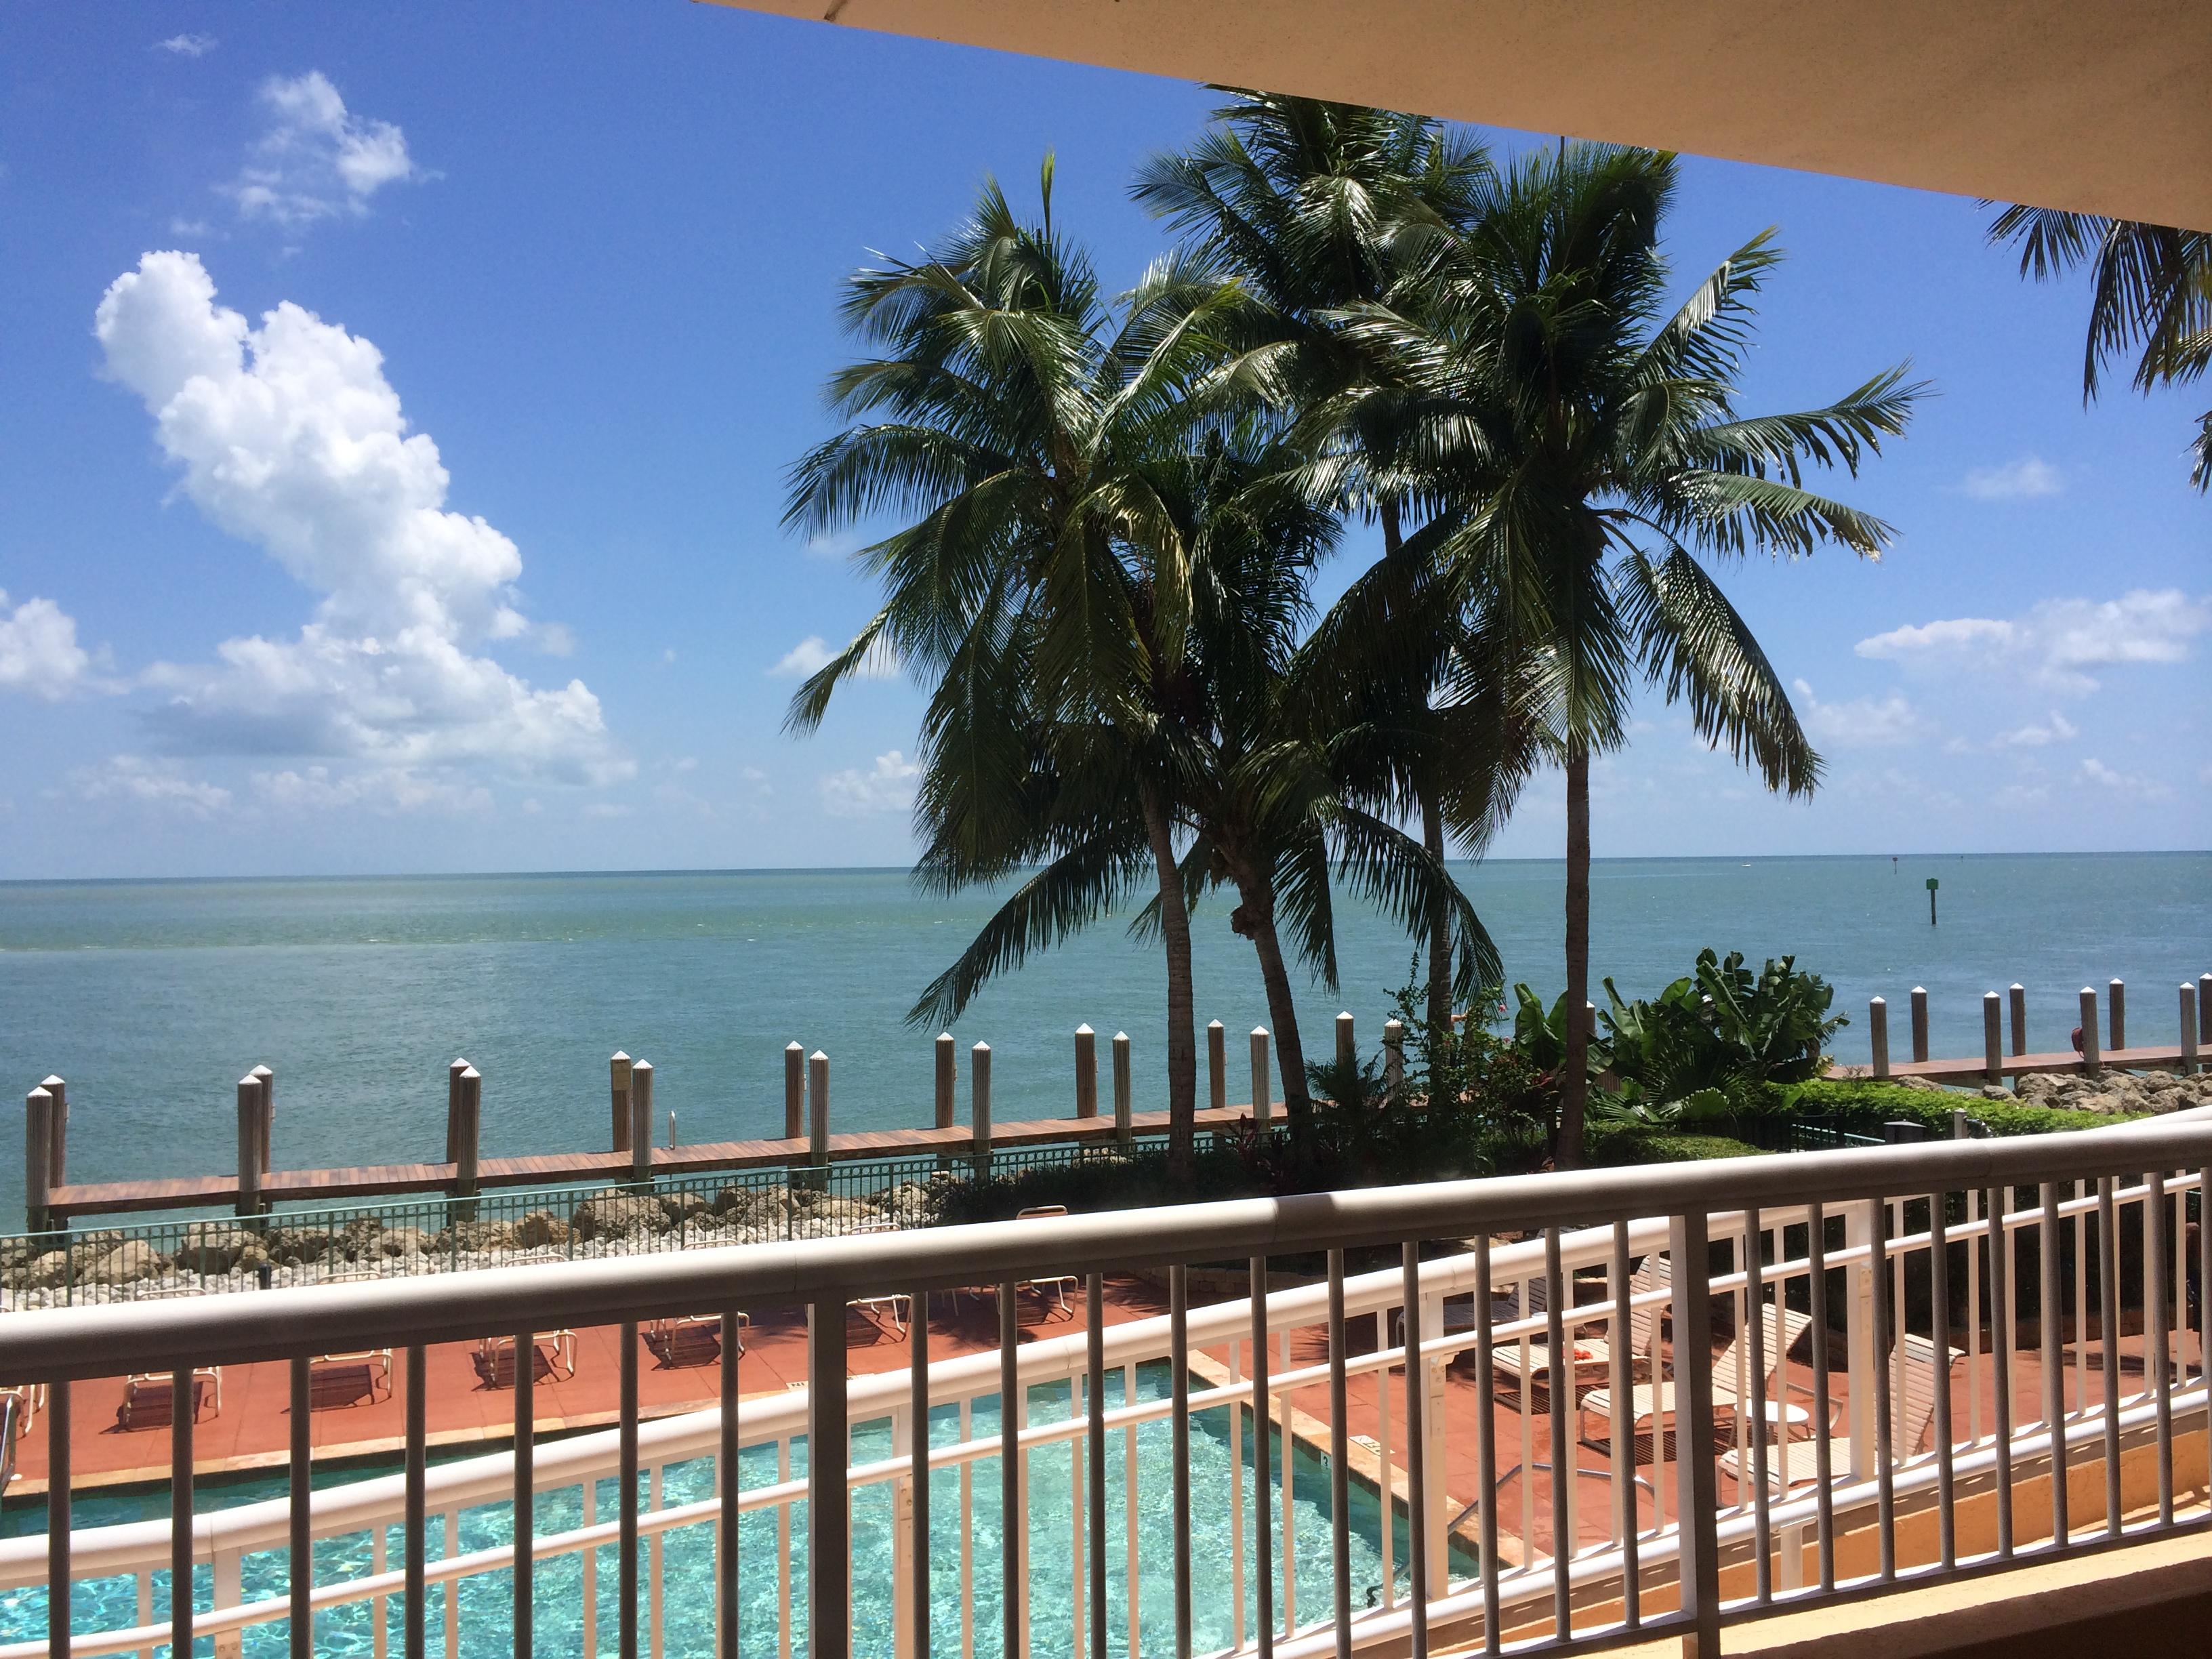 Caxambas Pass in Marco Island FL